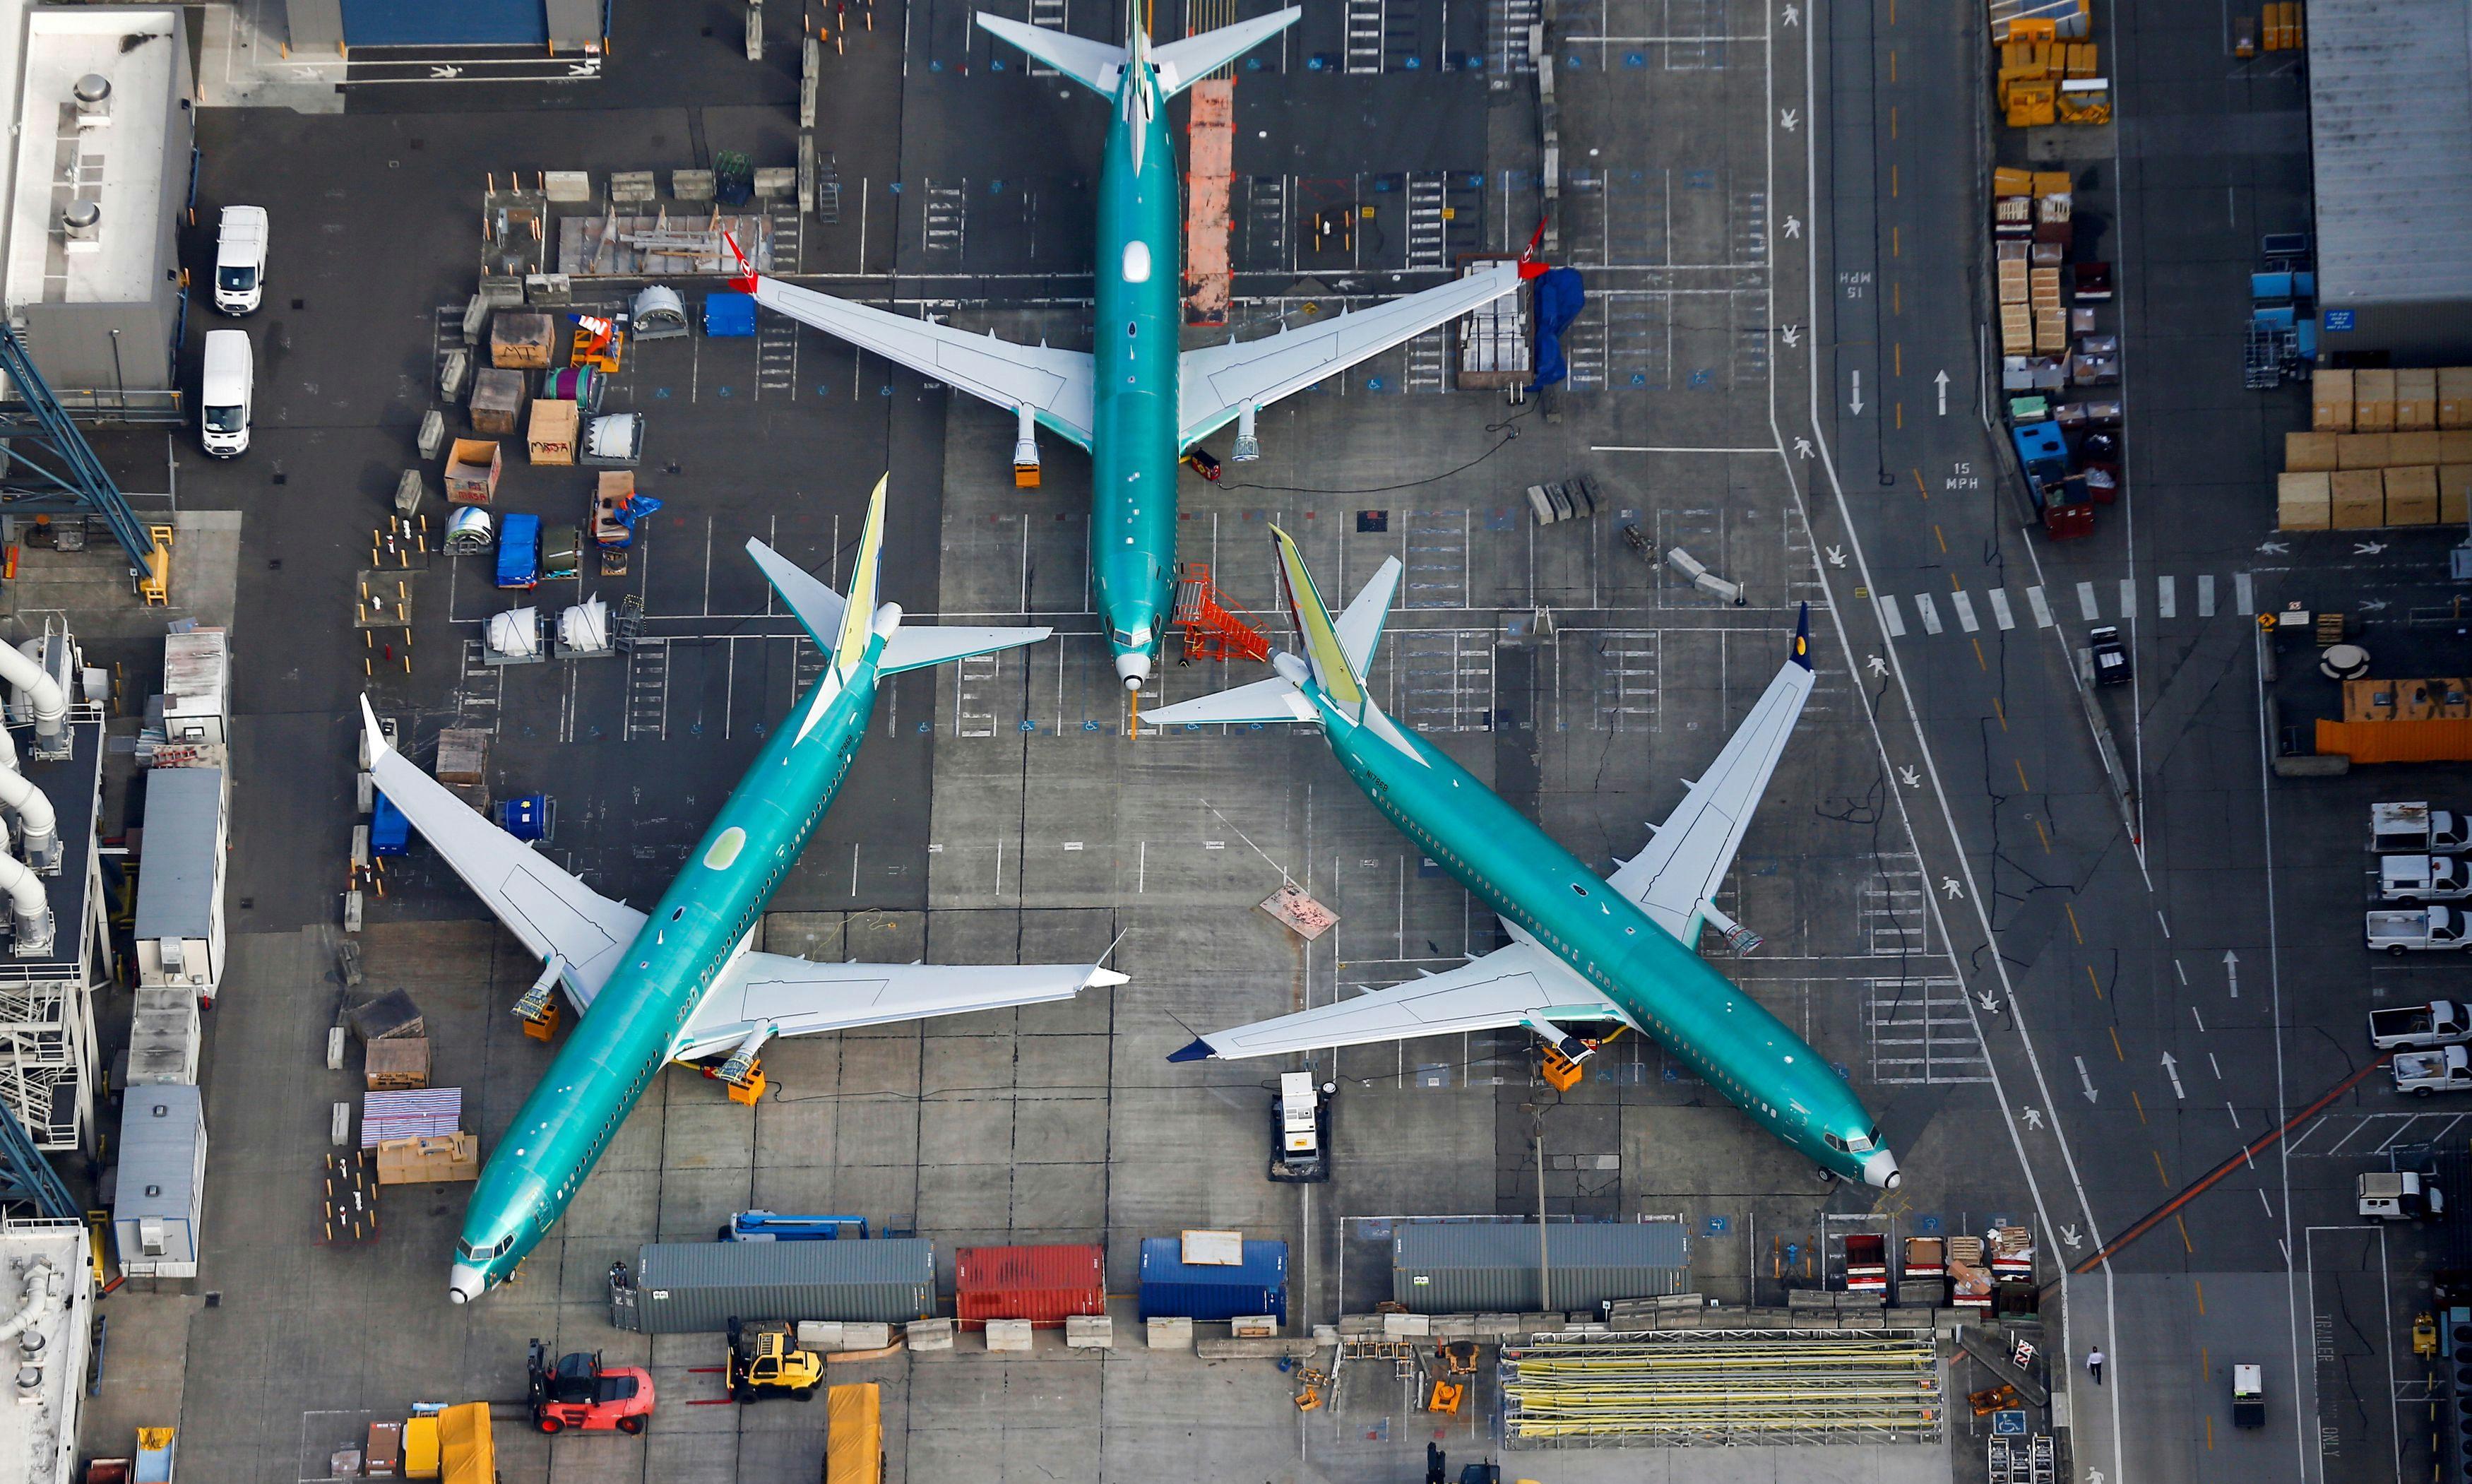 Boeing 737 Max: new 'troubling communications' sent to regulators